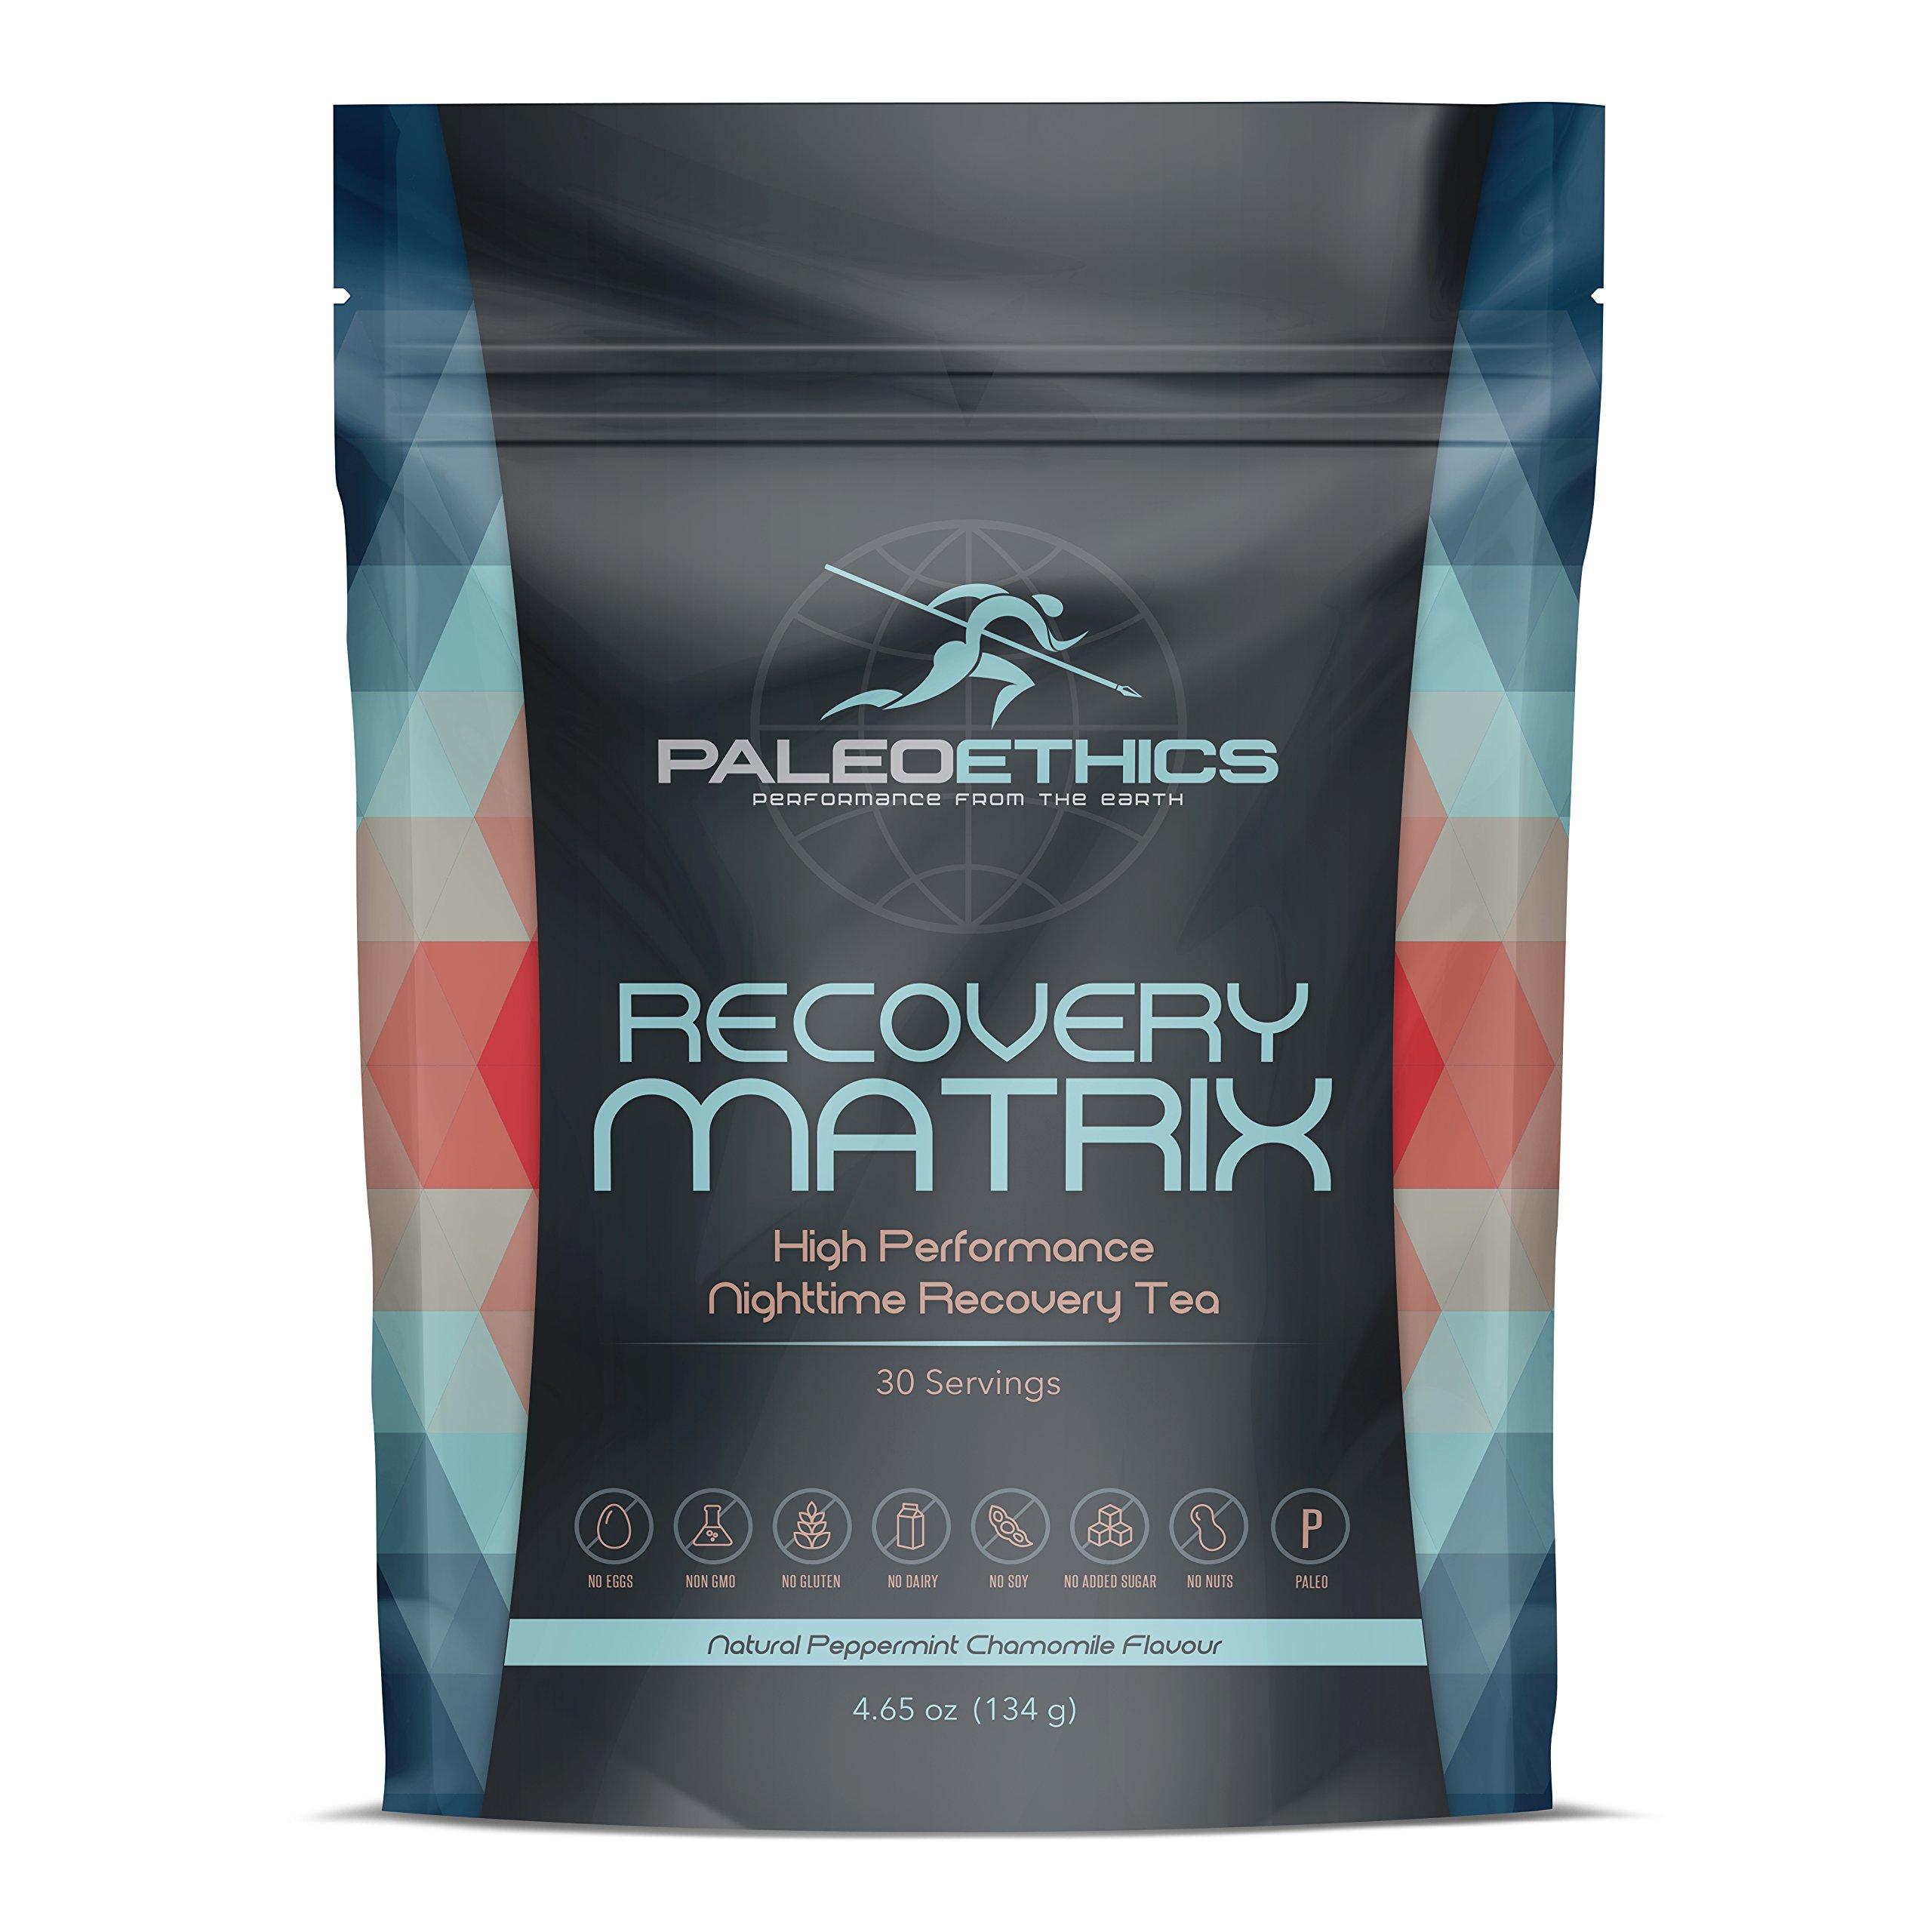 PALEOETHICS High Performance Recovery Matrix Recovery Tea Powder, Peppermint Chamomile, 4.65 oz, 134 Gram